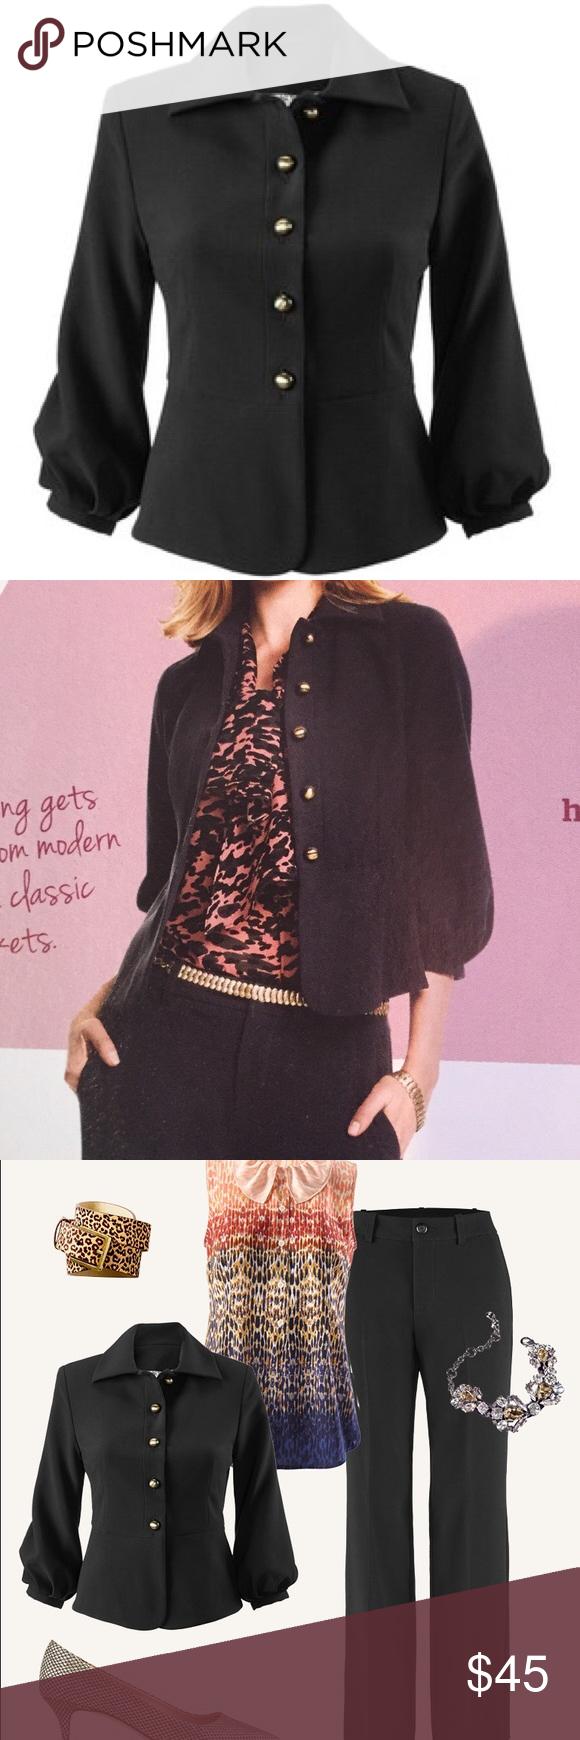 Cabi Abbott jacket, size 4 Fall 15 collection's Abbott jacket.  NWT Fully lined, gorgeous details. CAbi Jackets & Coats Blazers